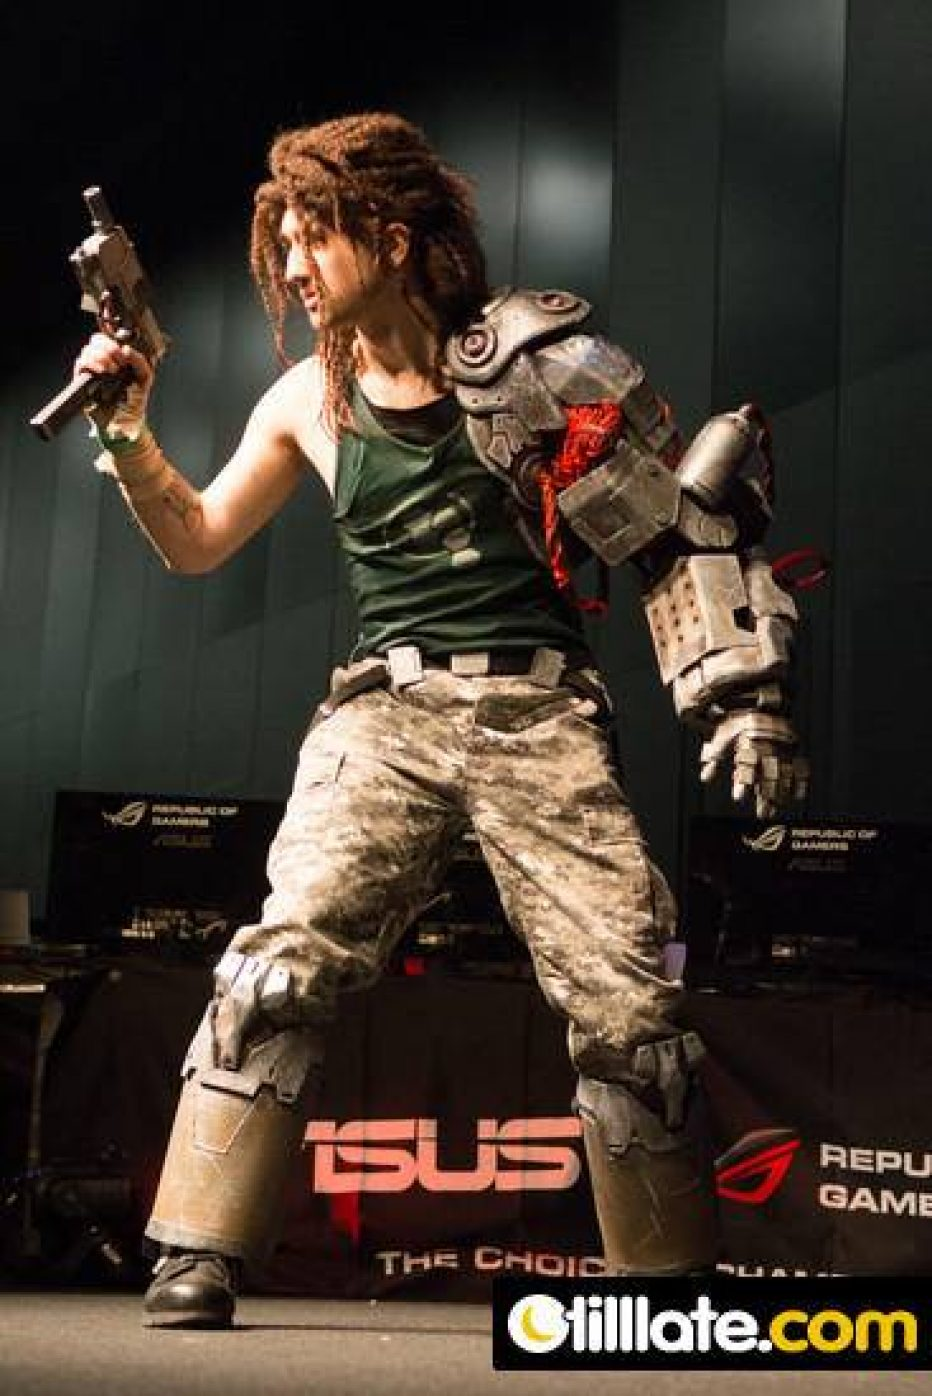 Bionic-Commando-Nathan-Spencer-Cosplay-Gamers-Heroes-9.jpg